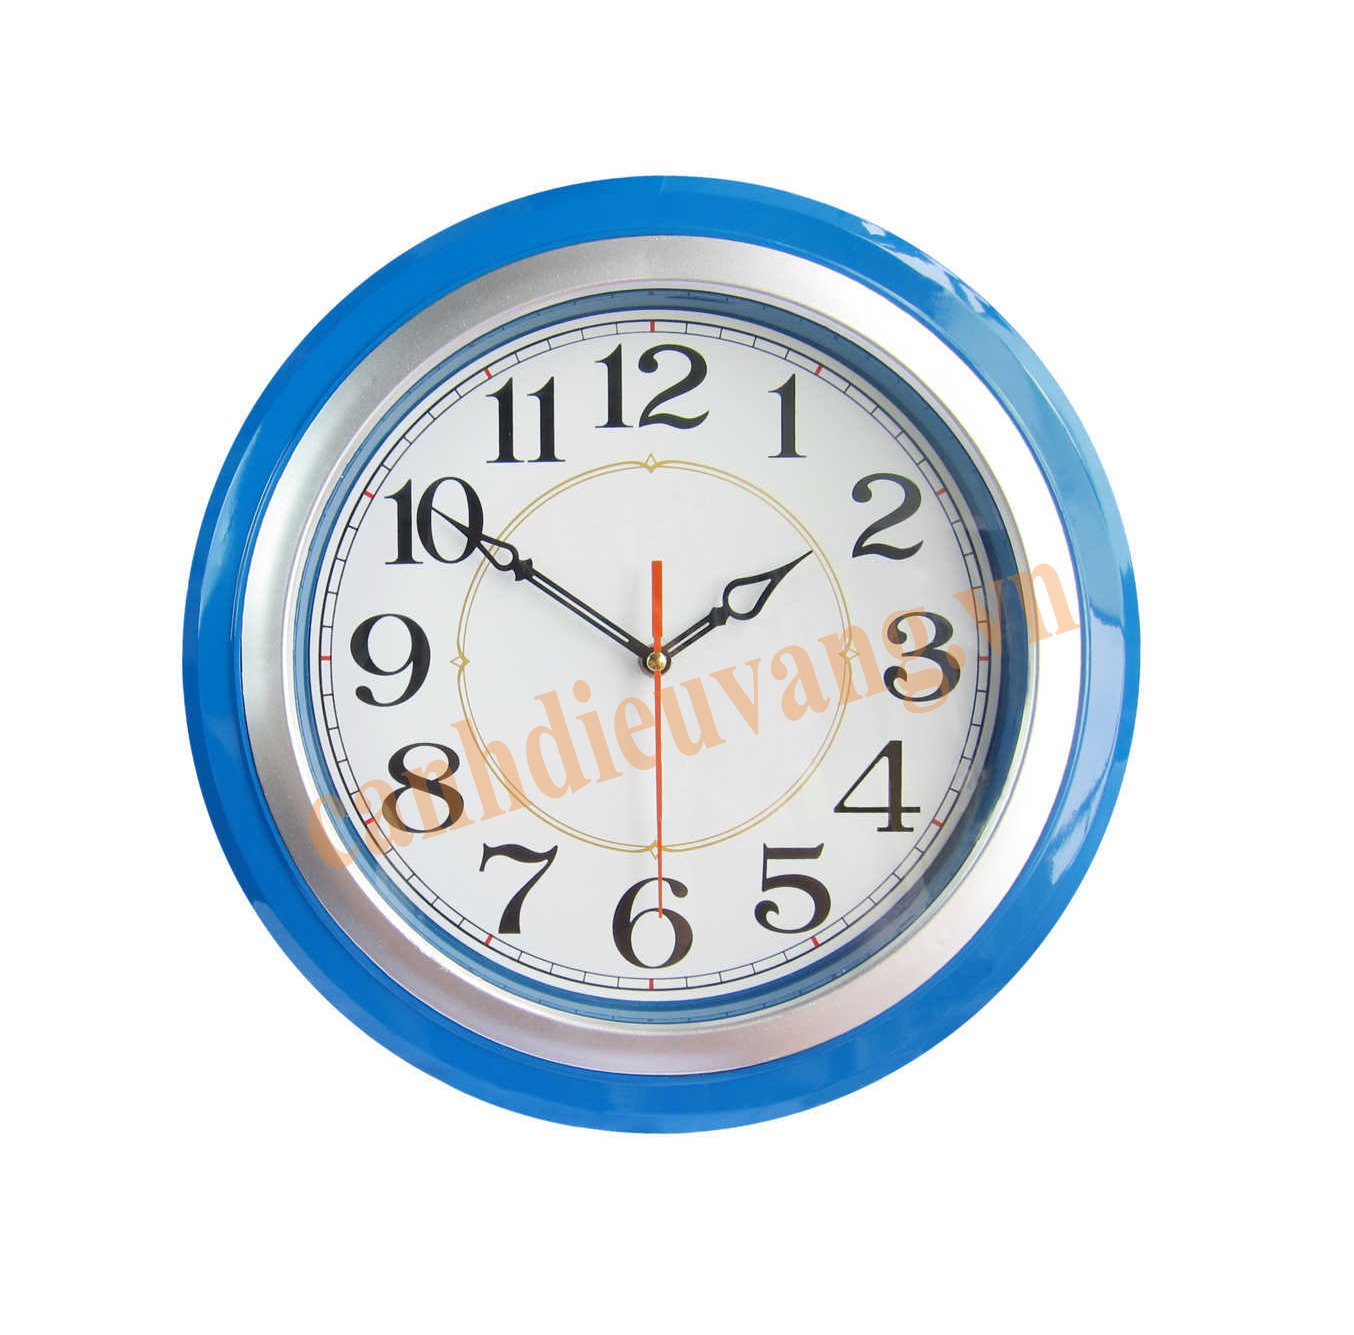 Đồng hồ treo tường B150